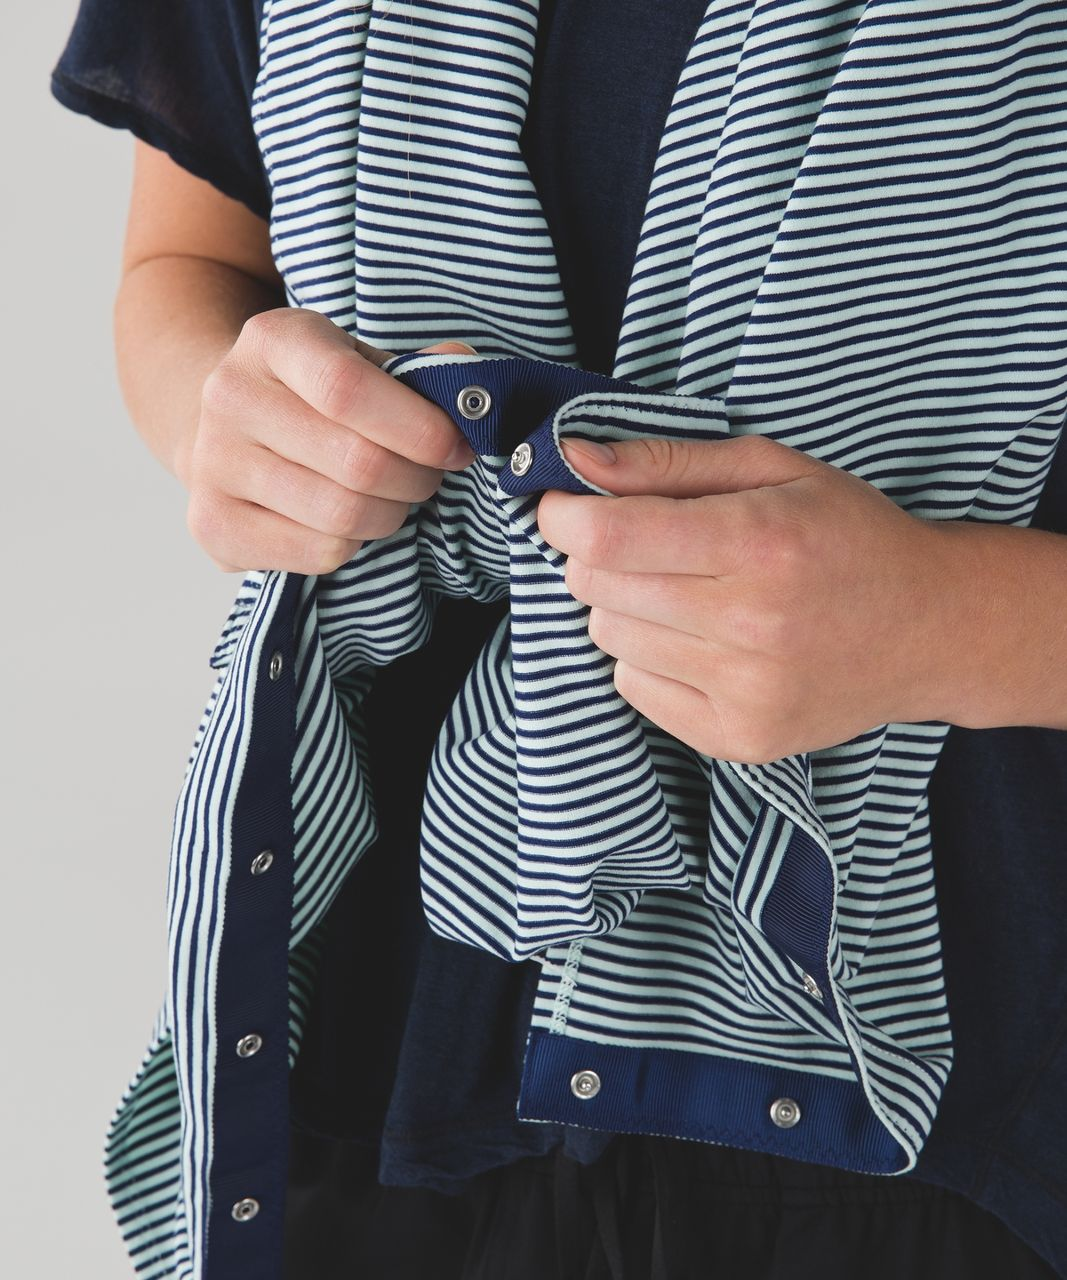 Lululemon Vinyasa Scarf - Hyper Stripe Sea Mist Hero Blue / Hero Blue